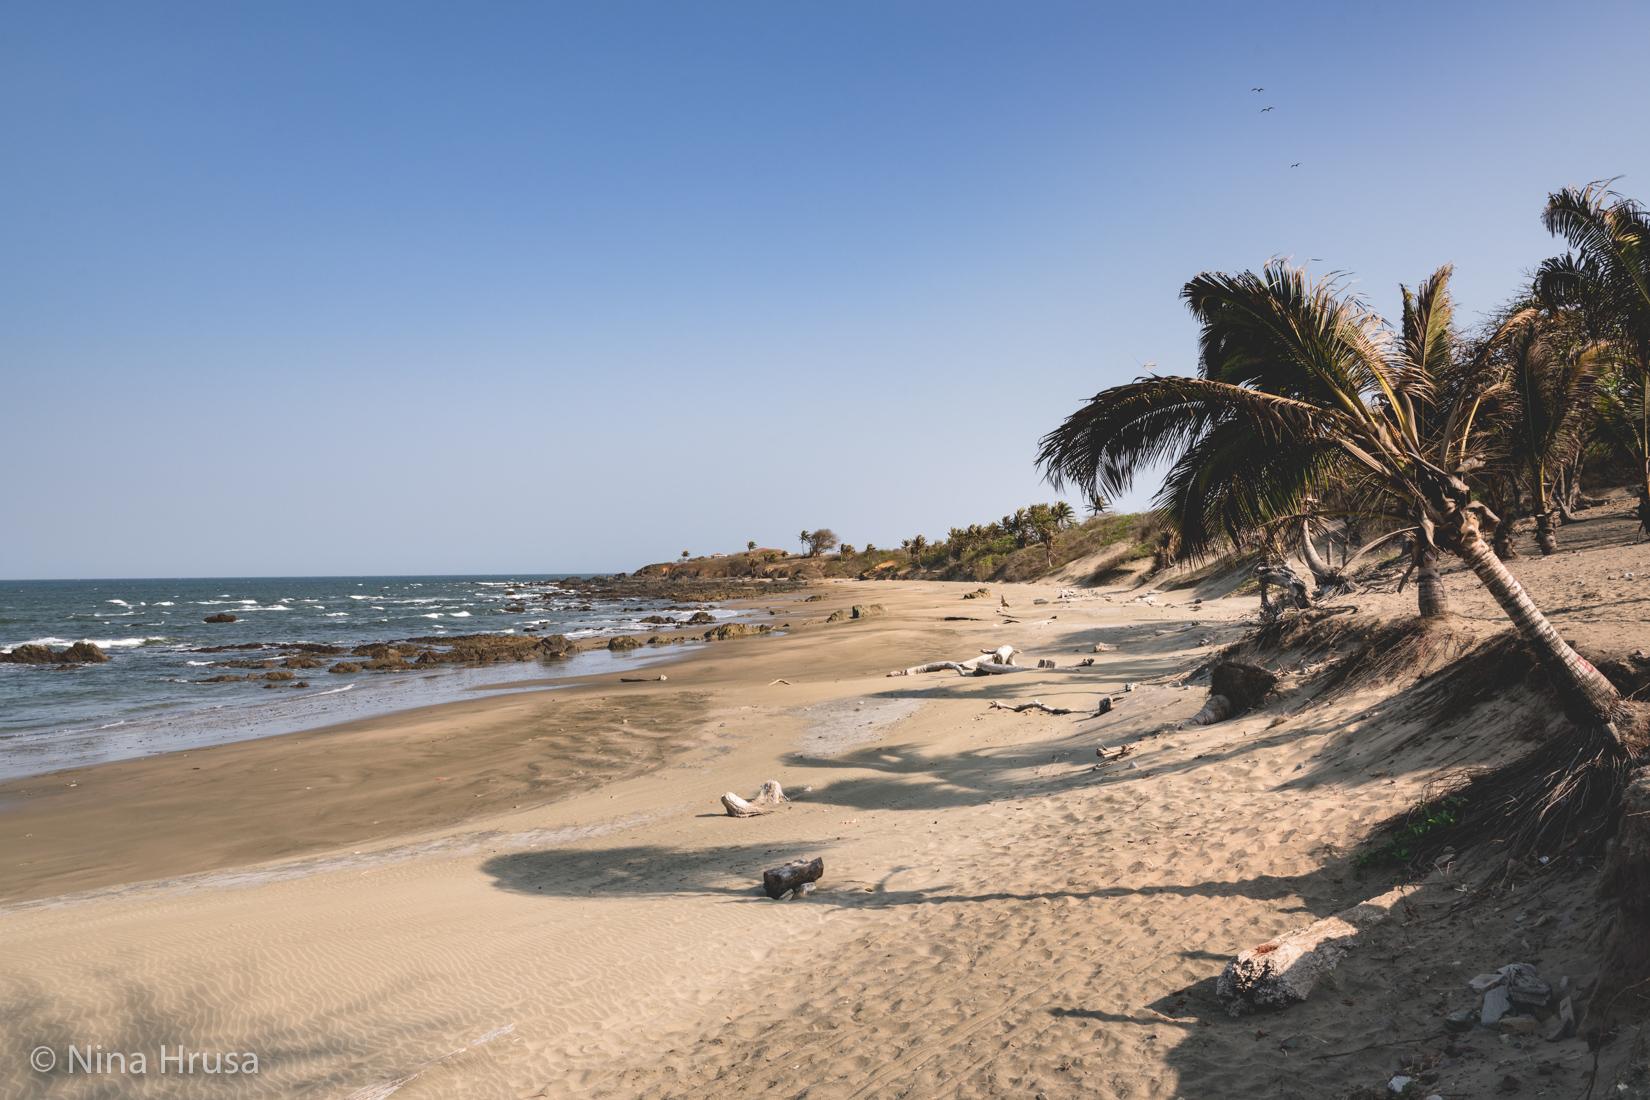 Strand in Panama, Zwischenmomente | Nina Hrusa Photography